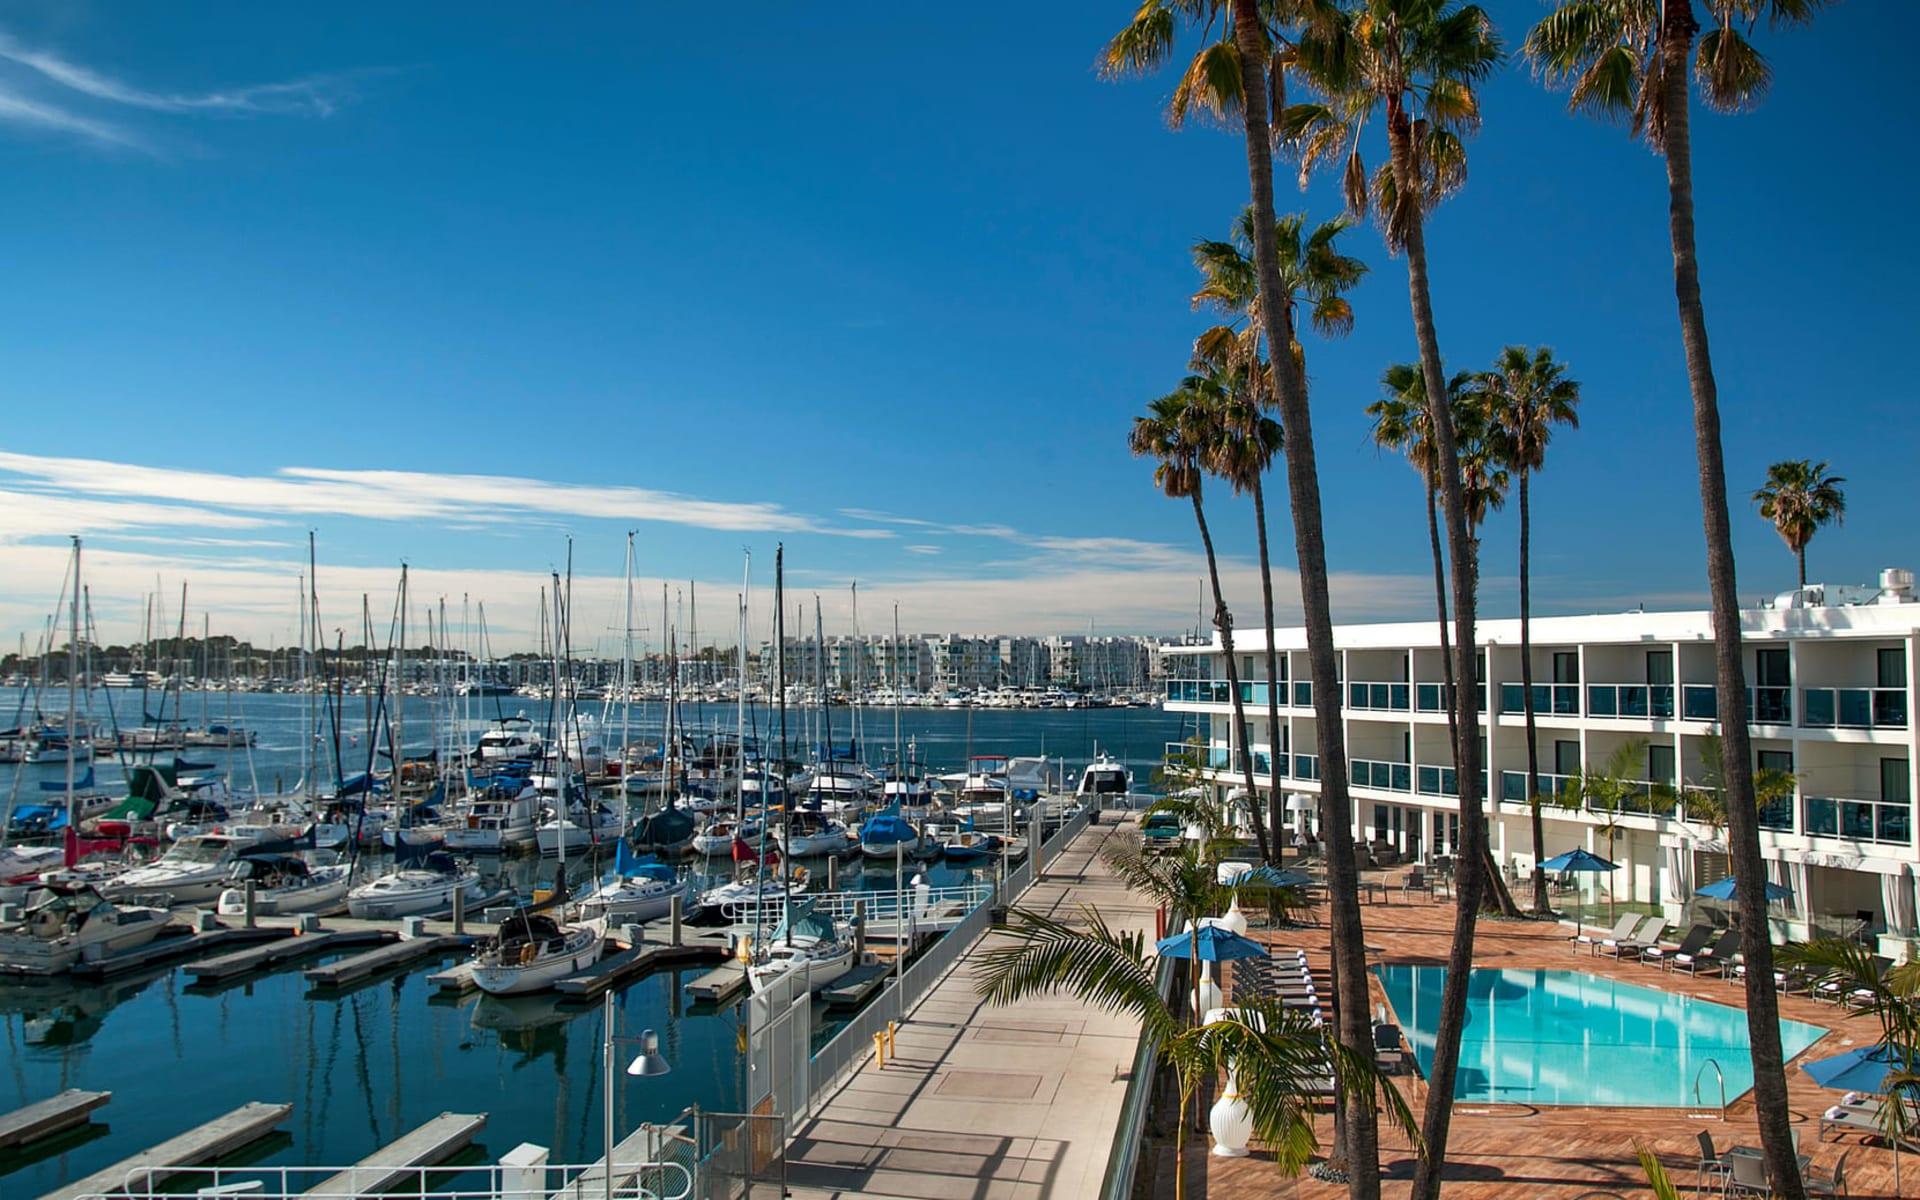 Marina del Rey Hotel:  Marina del Rey - Pool Hotel Hafen